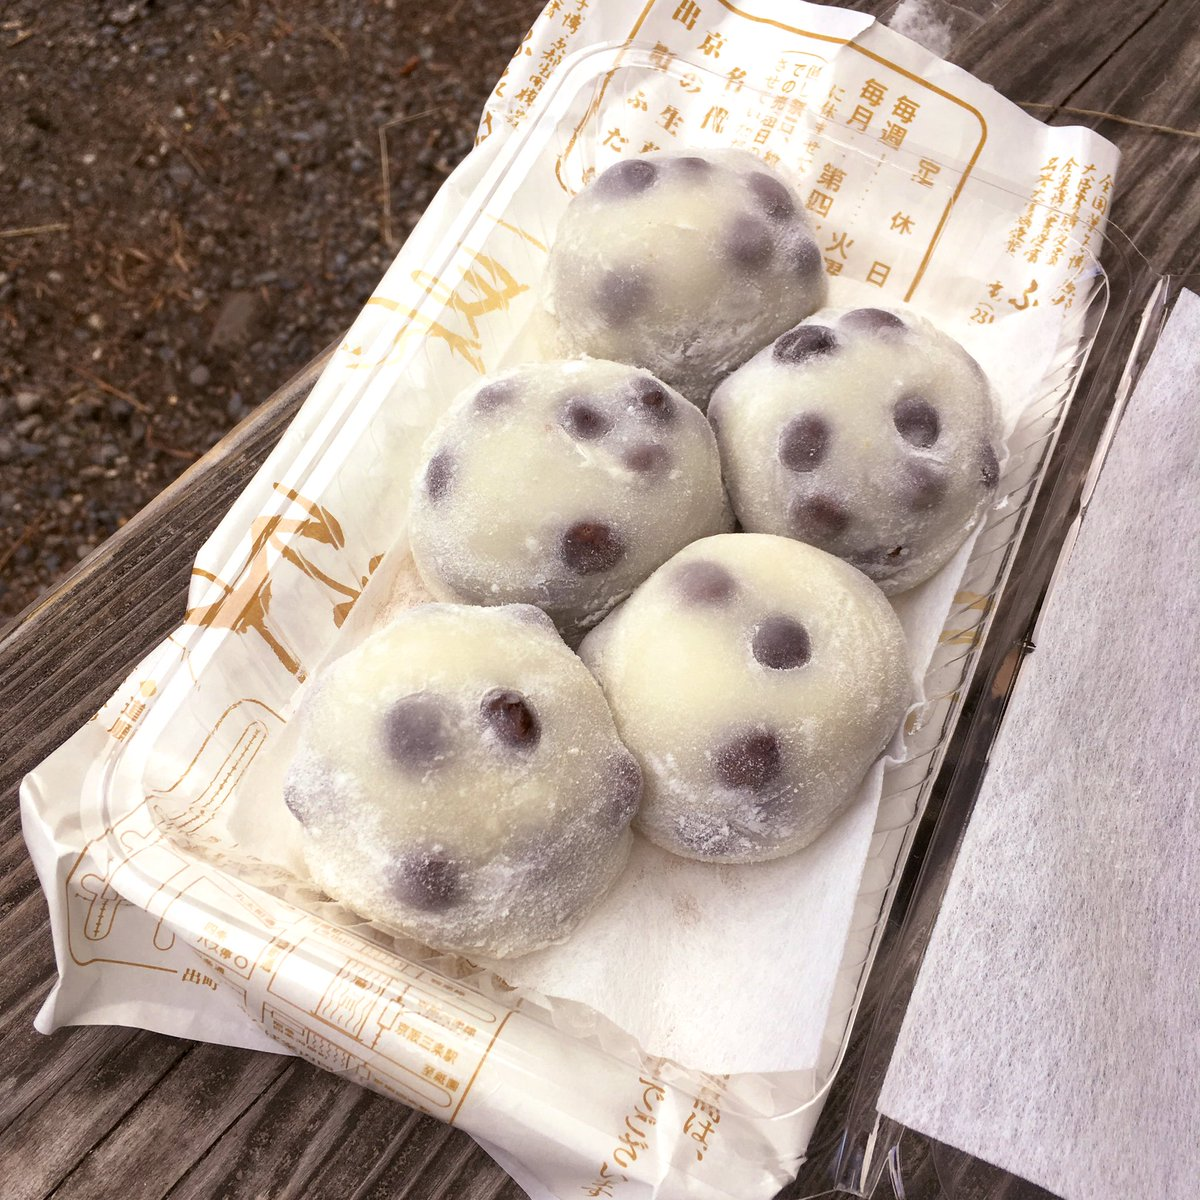 test ツイッターメディア - 出町ふたばの豆餅ー!!! https://t.co/YcA2xMhFeA